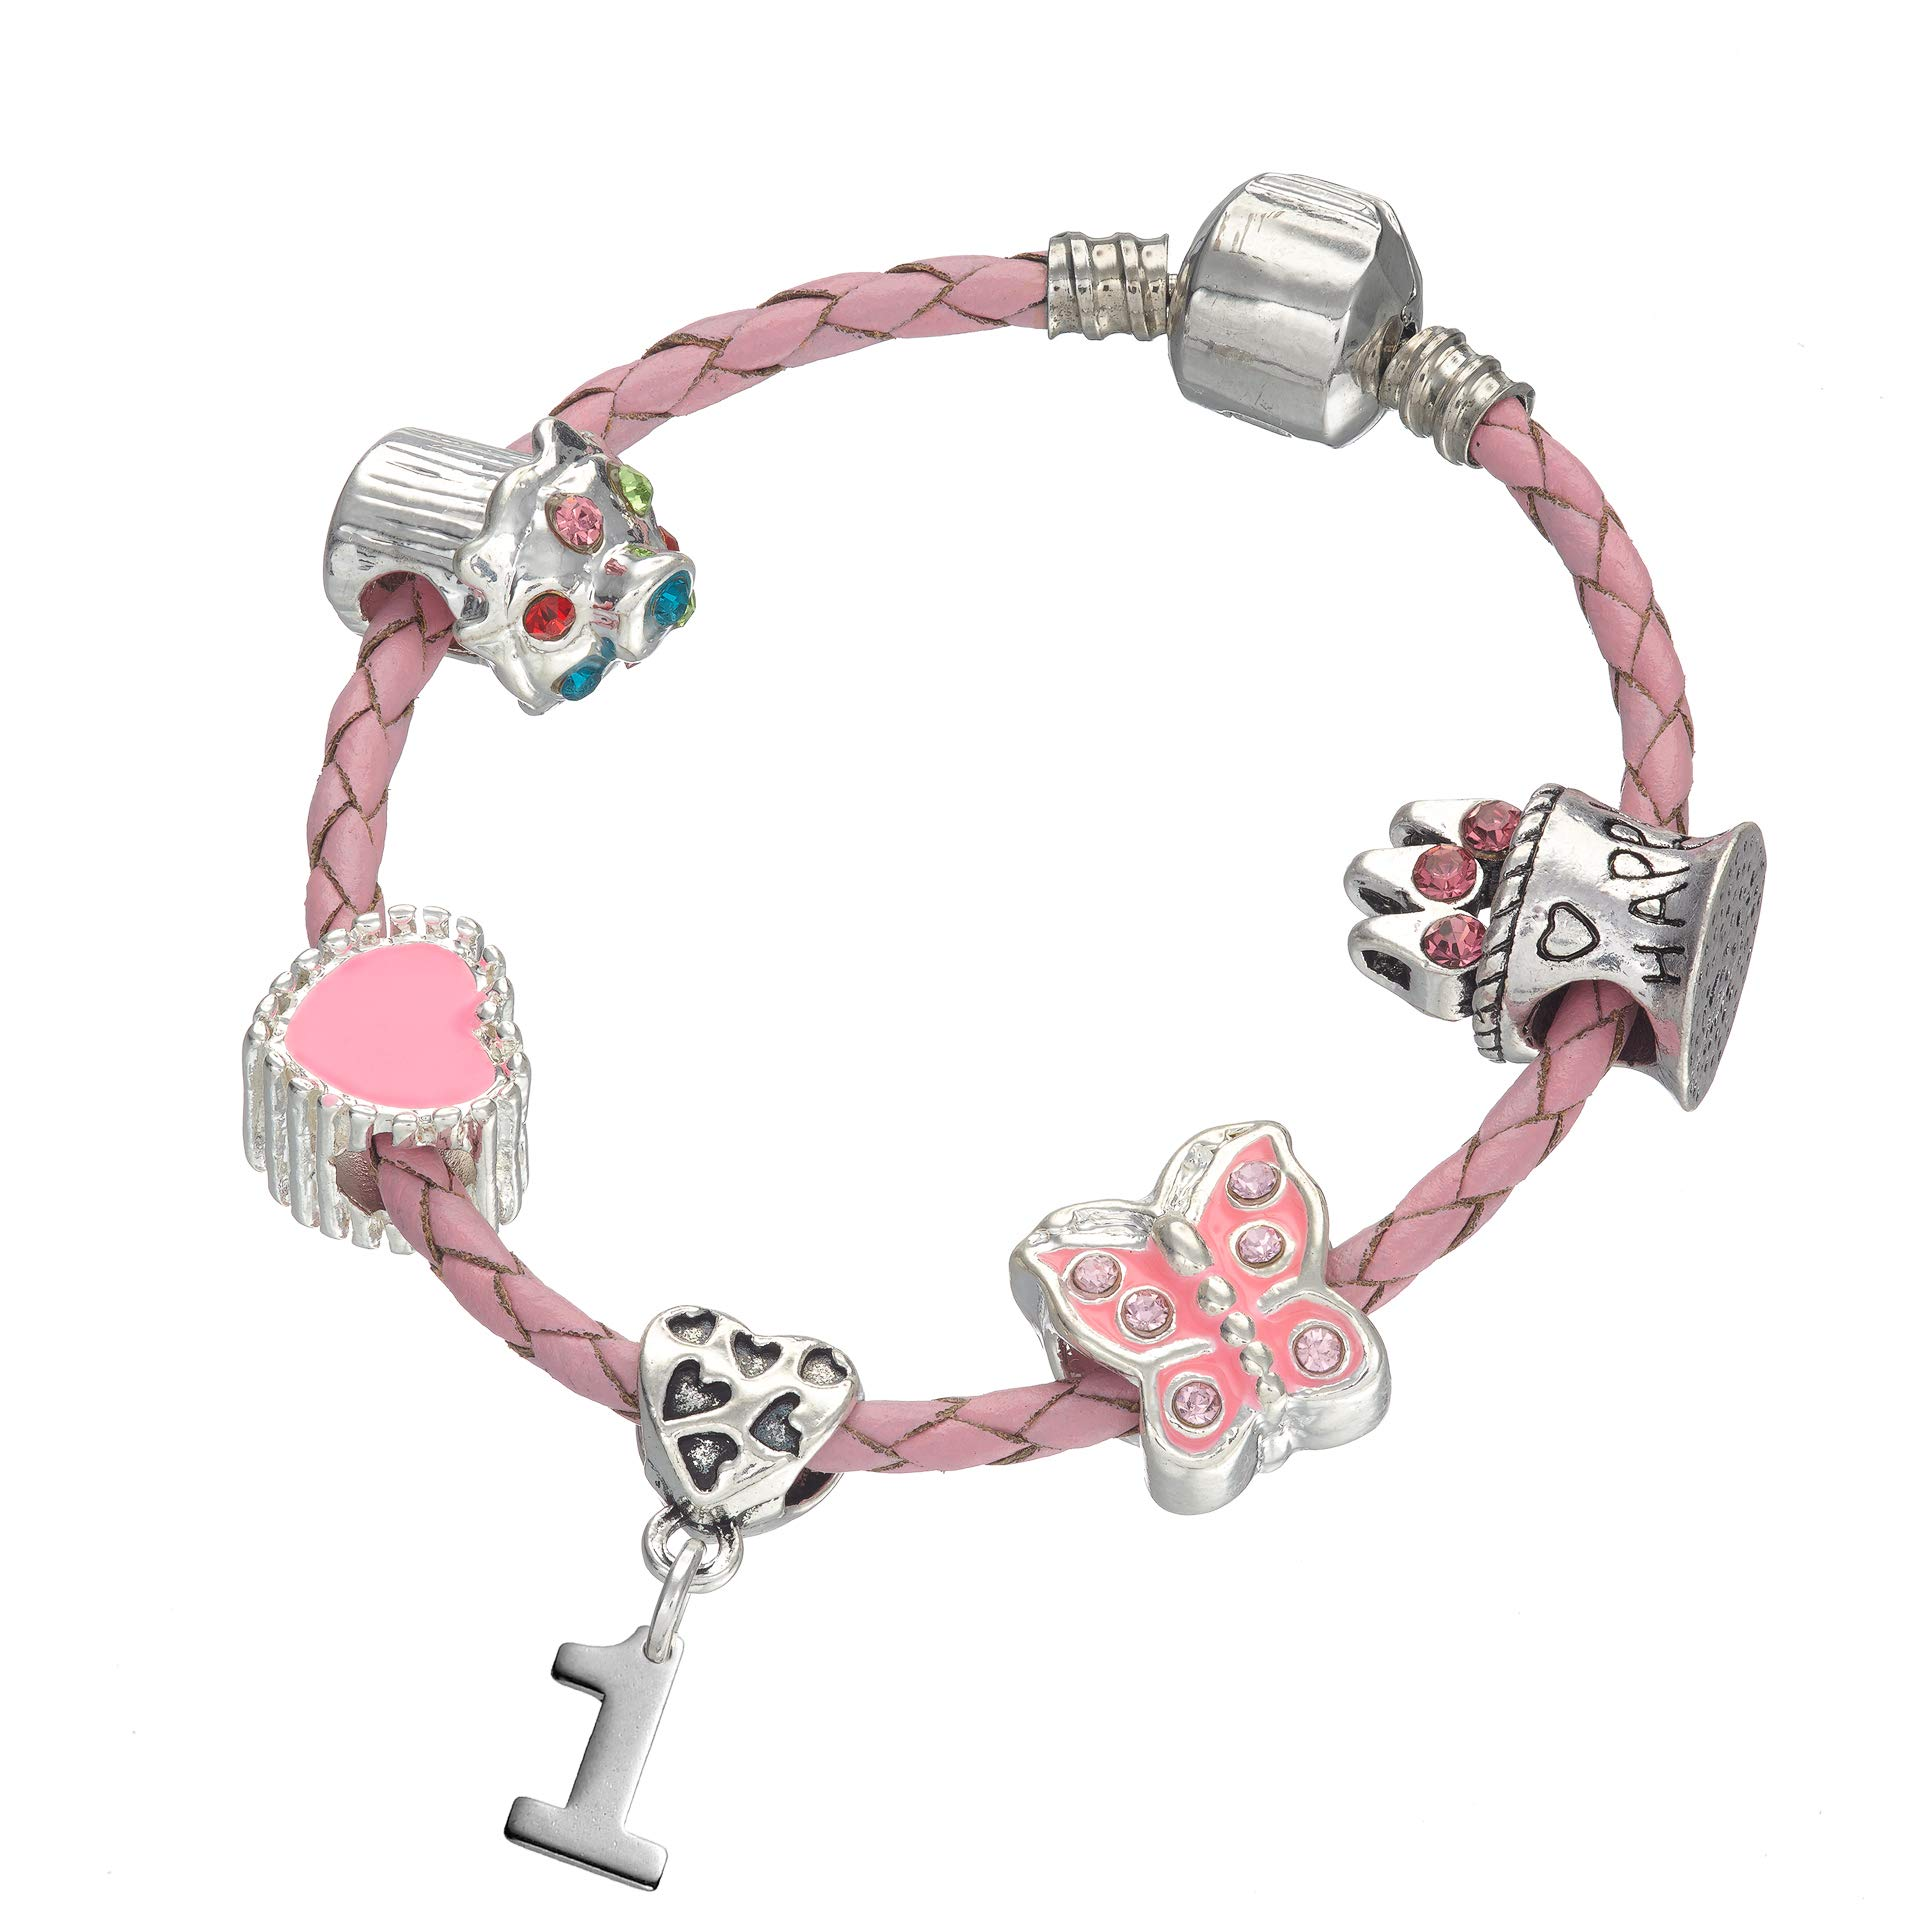 Children's Pink Leather Happy 1st Birthday Charm Bracelet with Gift Box – Girl's & Children's Birthday Gift Jewellery